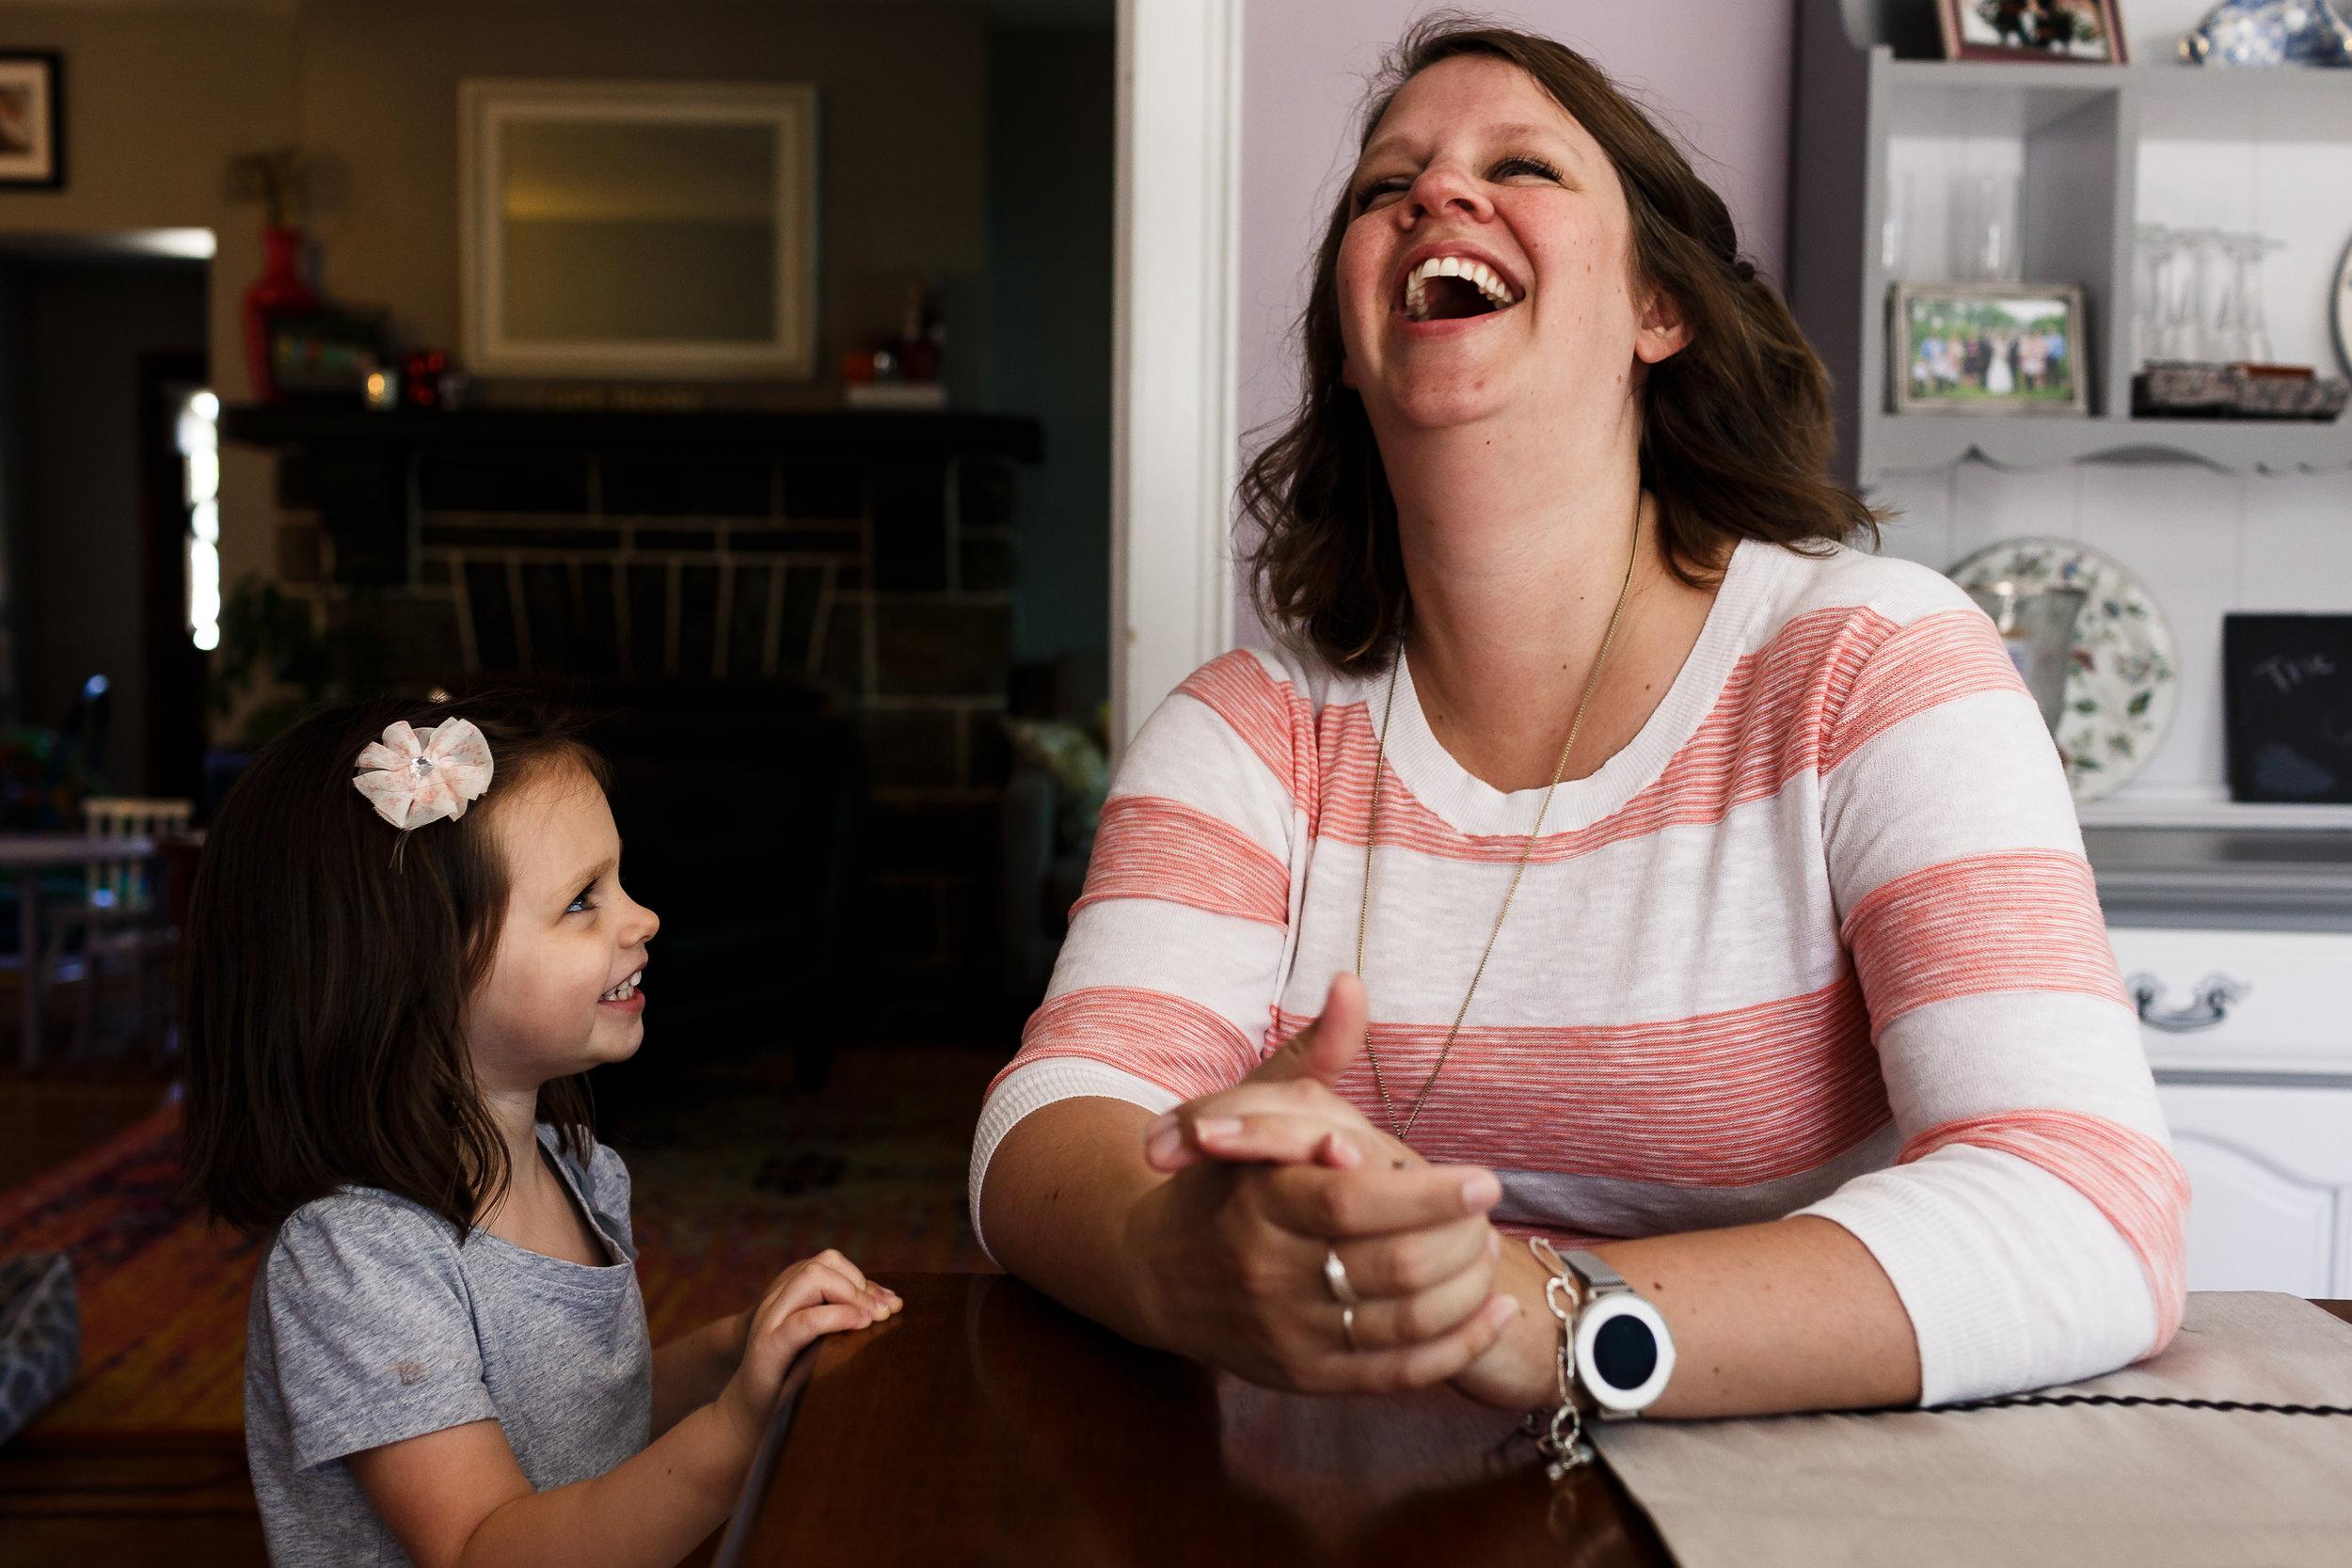 daughter watching mom laugh